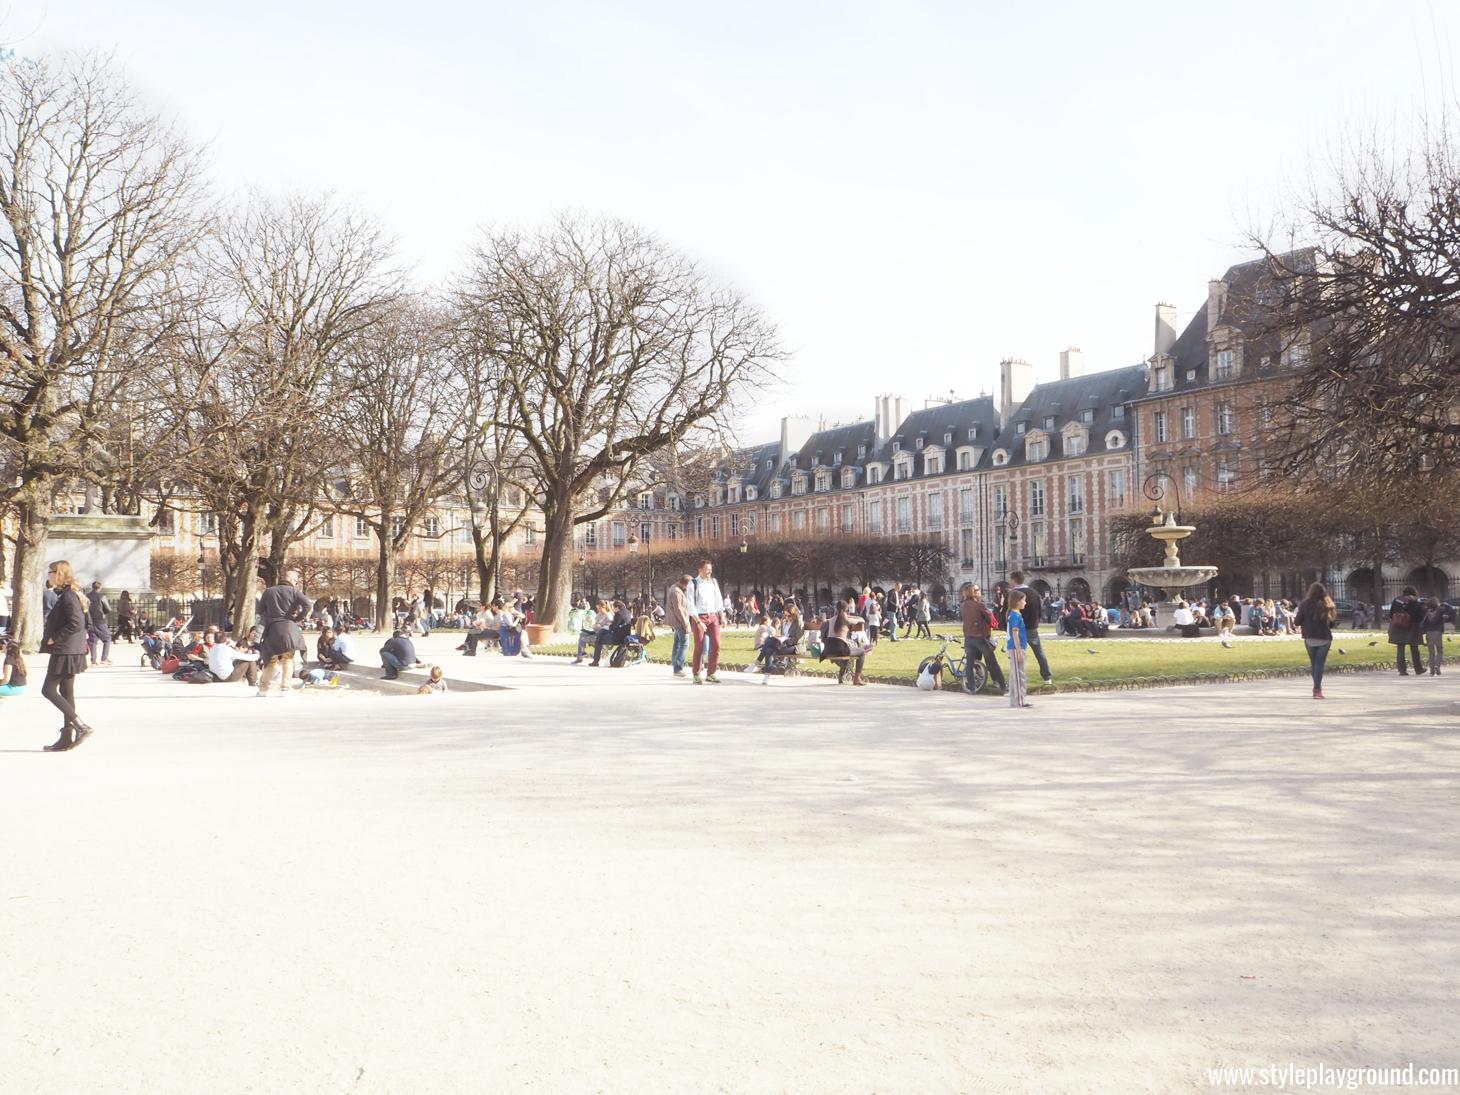 Paris photo diary by Axelle Blanpain of Style playground